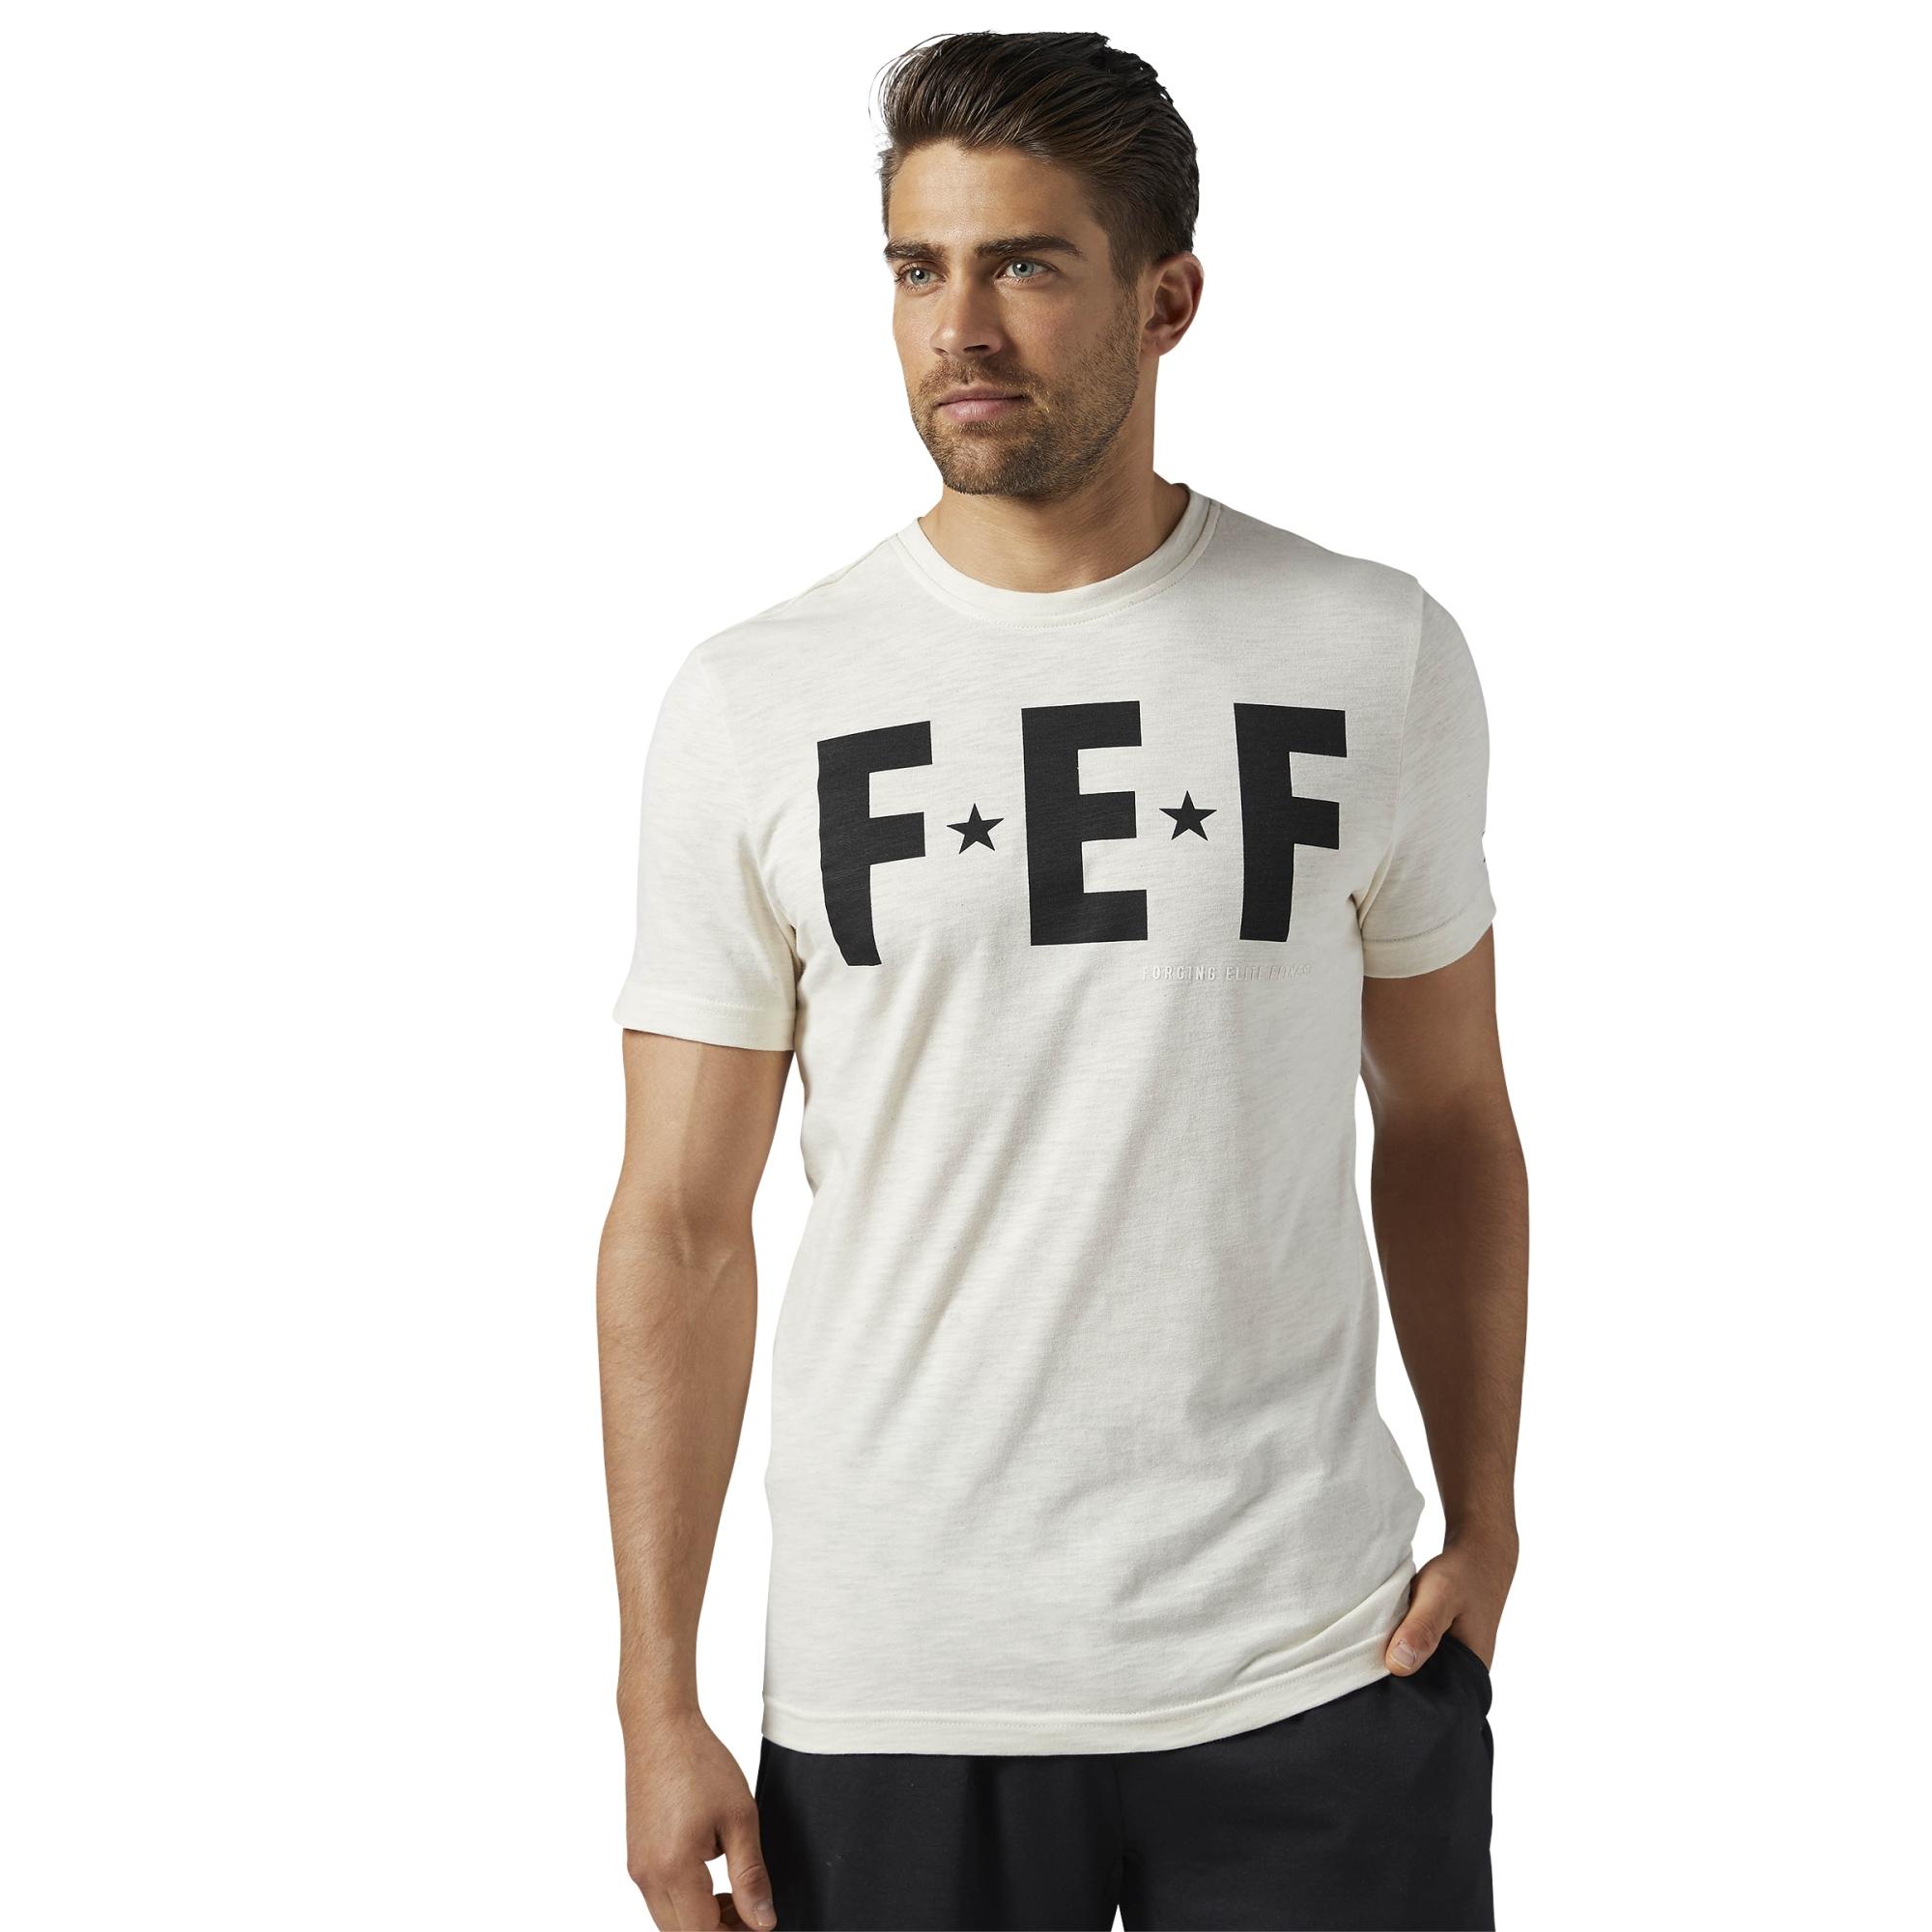 41d3ee64 koszulka Reebok CrossFit F.E.F. Graphic BR0846 || timsport.pl ...